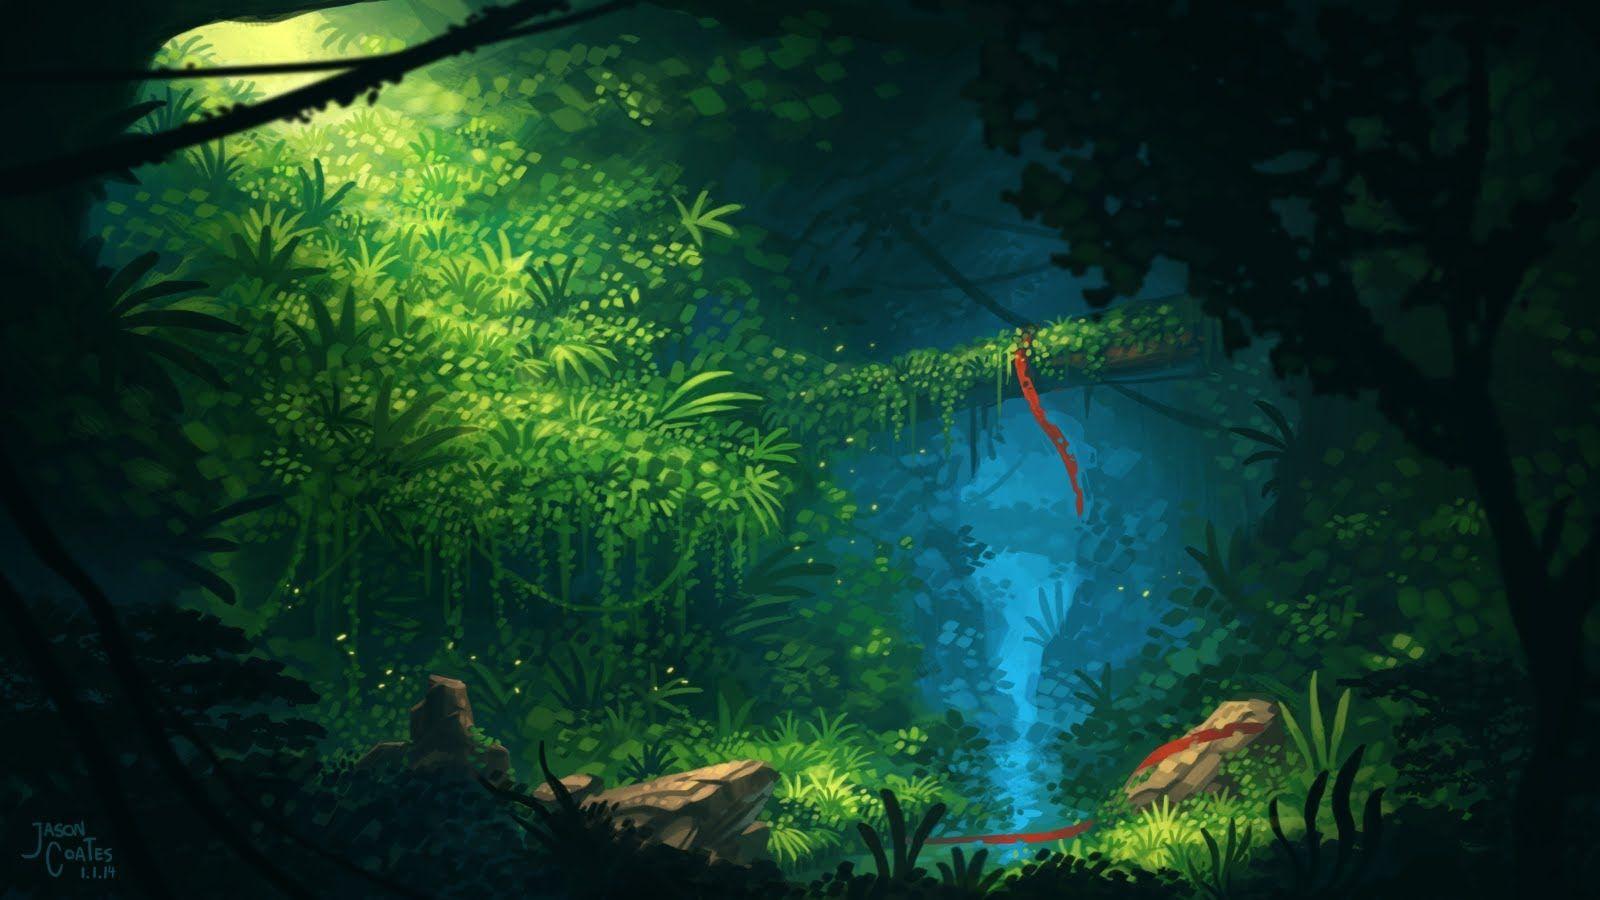 Timelapse Digital Painting Overgrown Cave Timelapse Digital